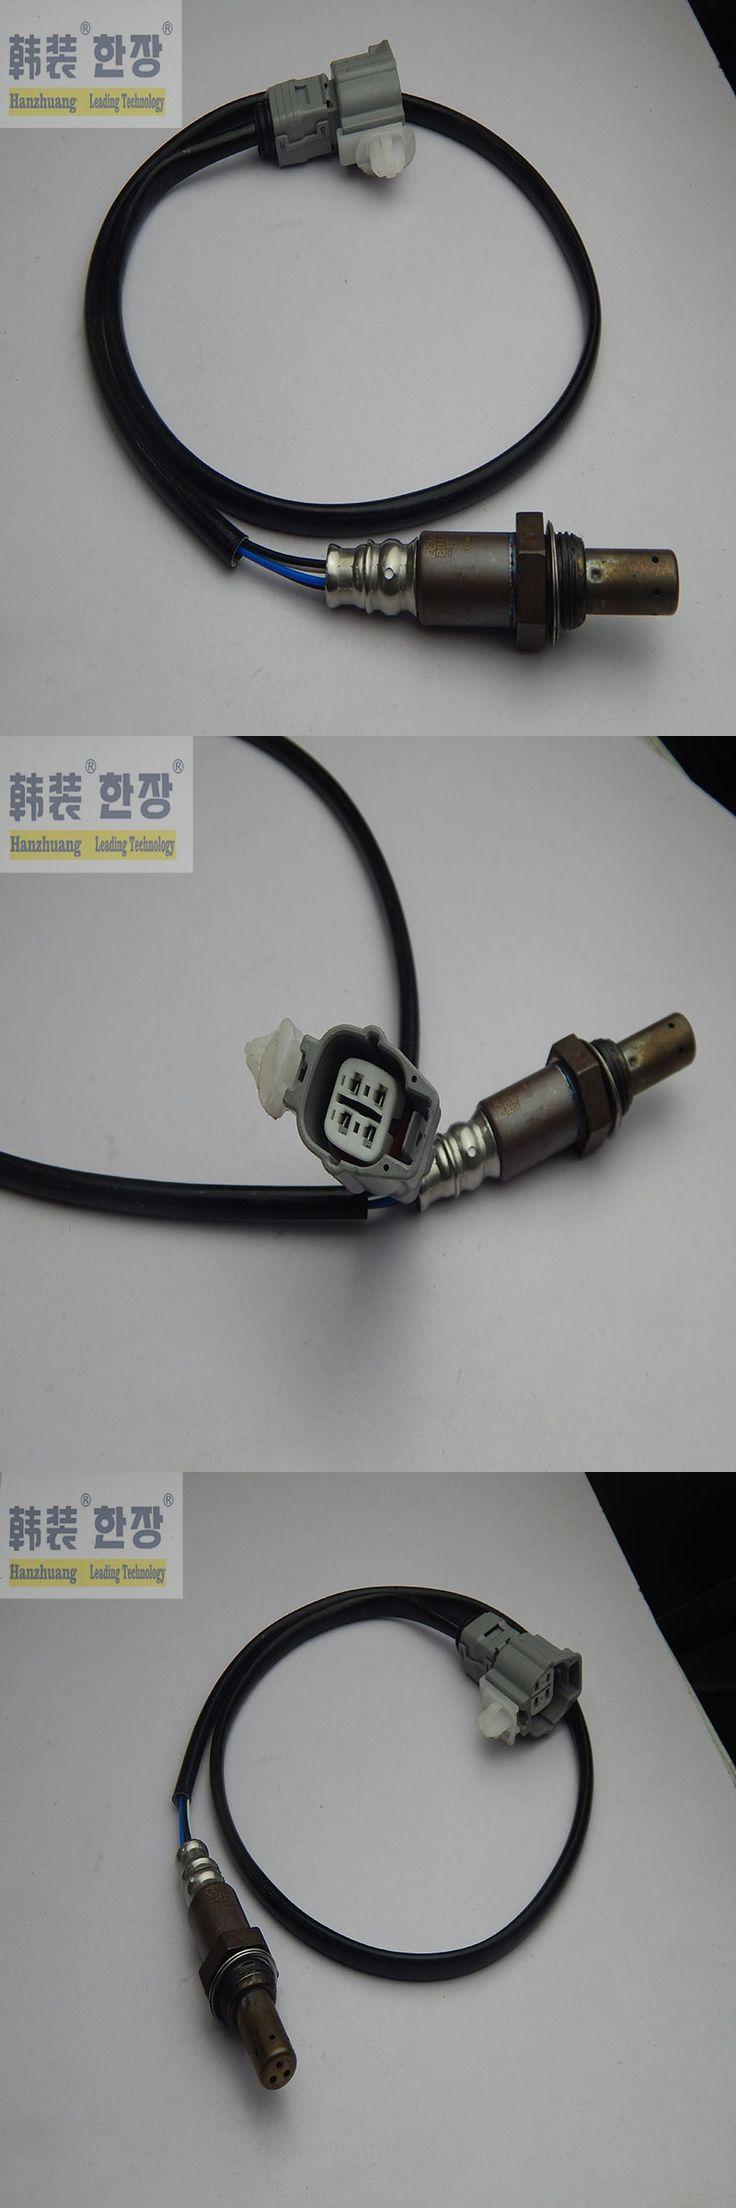 Leading Technology O2/Lambda/Oxygen Sensor for Toyota Lexus RX400H 2006-2008 OEM. 89465-48200 8946548200